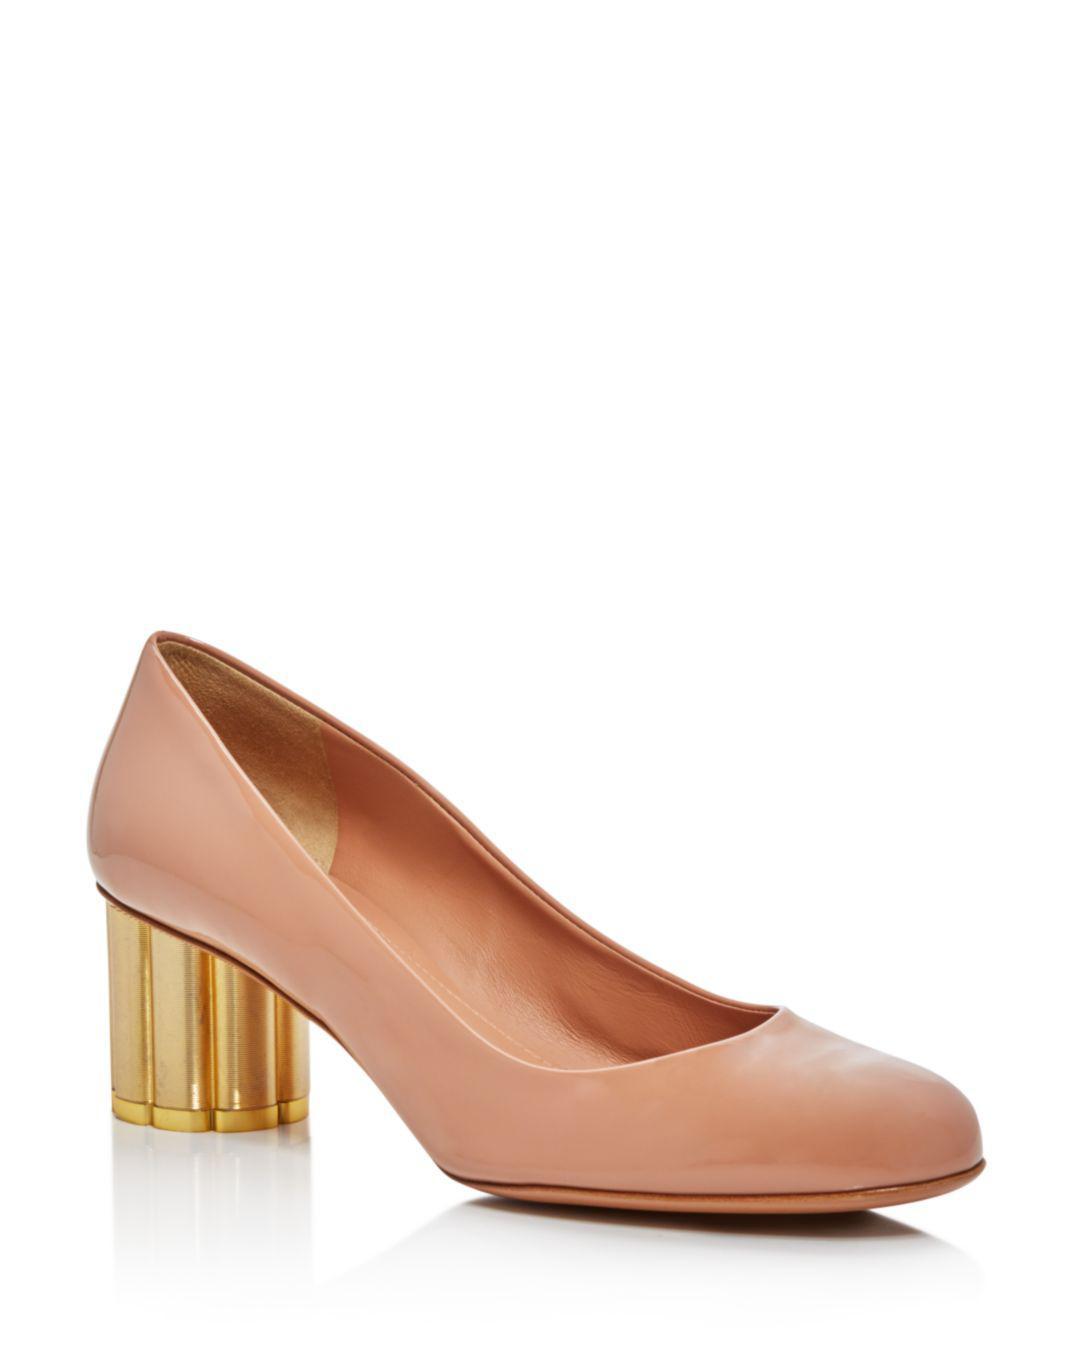 04b777fbb359 Lyst - Ferragamo Lucca Flower-heel Patent-leather Pumps - Save 59%